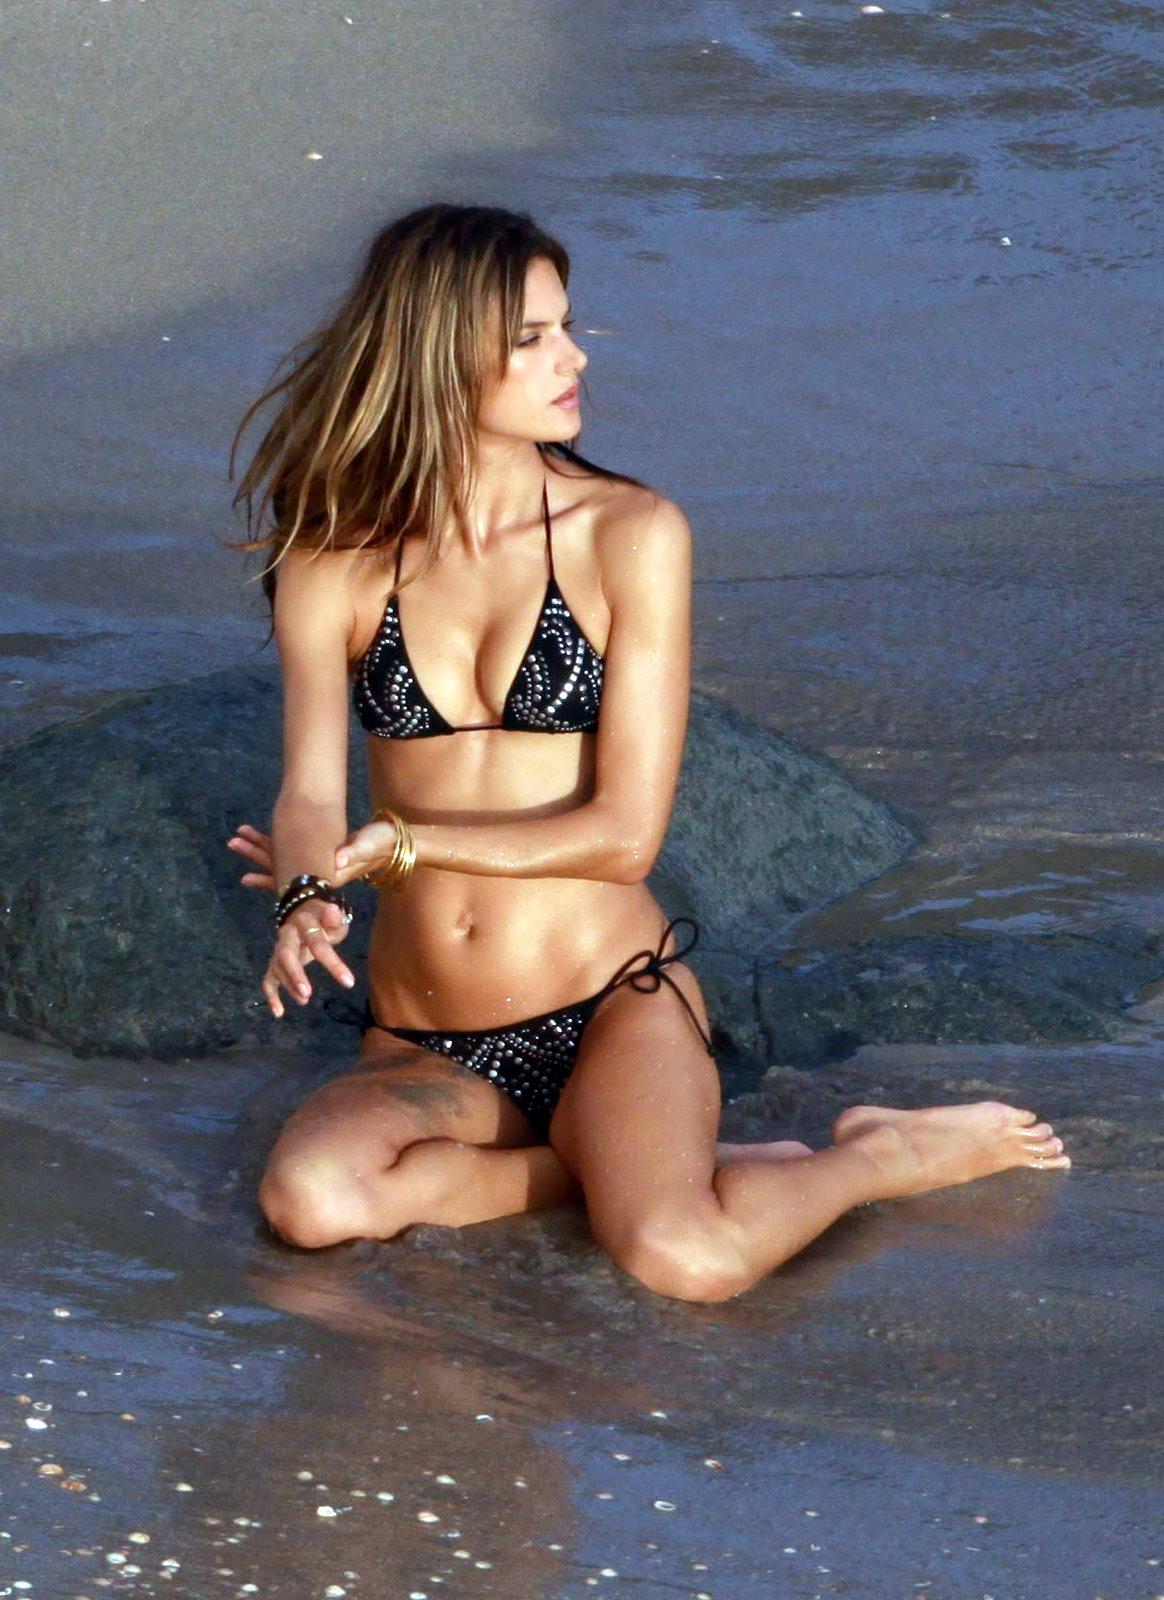 [Alessandra_Ambrosio_Bikini_09110056.jpg]